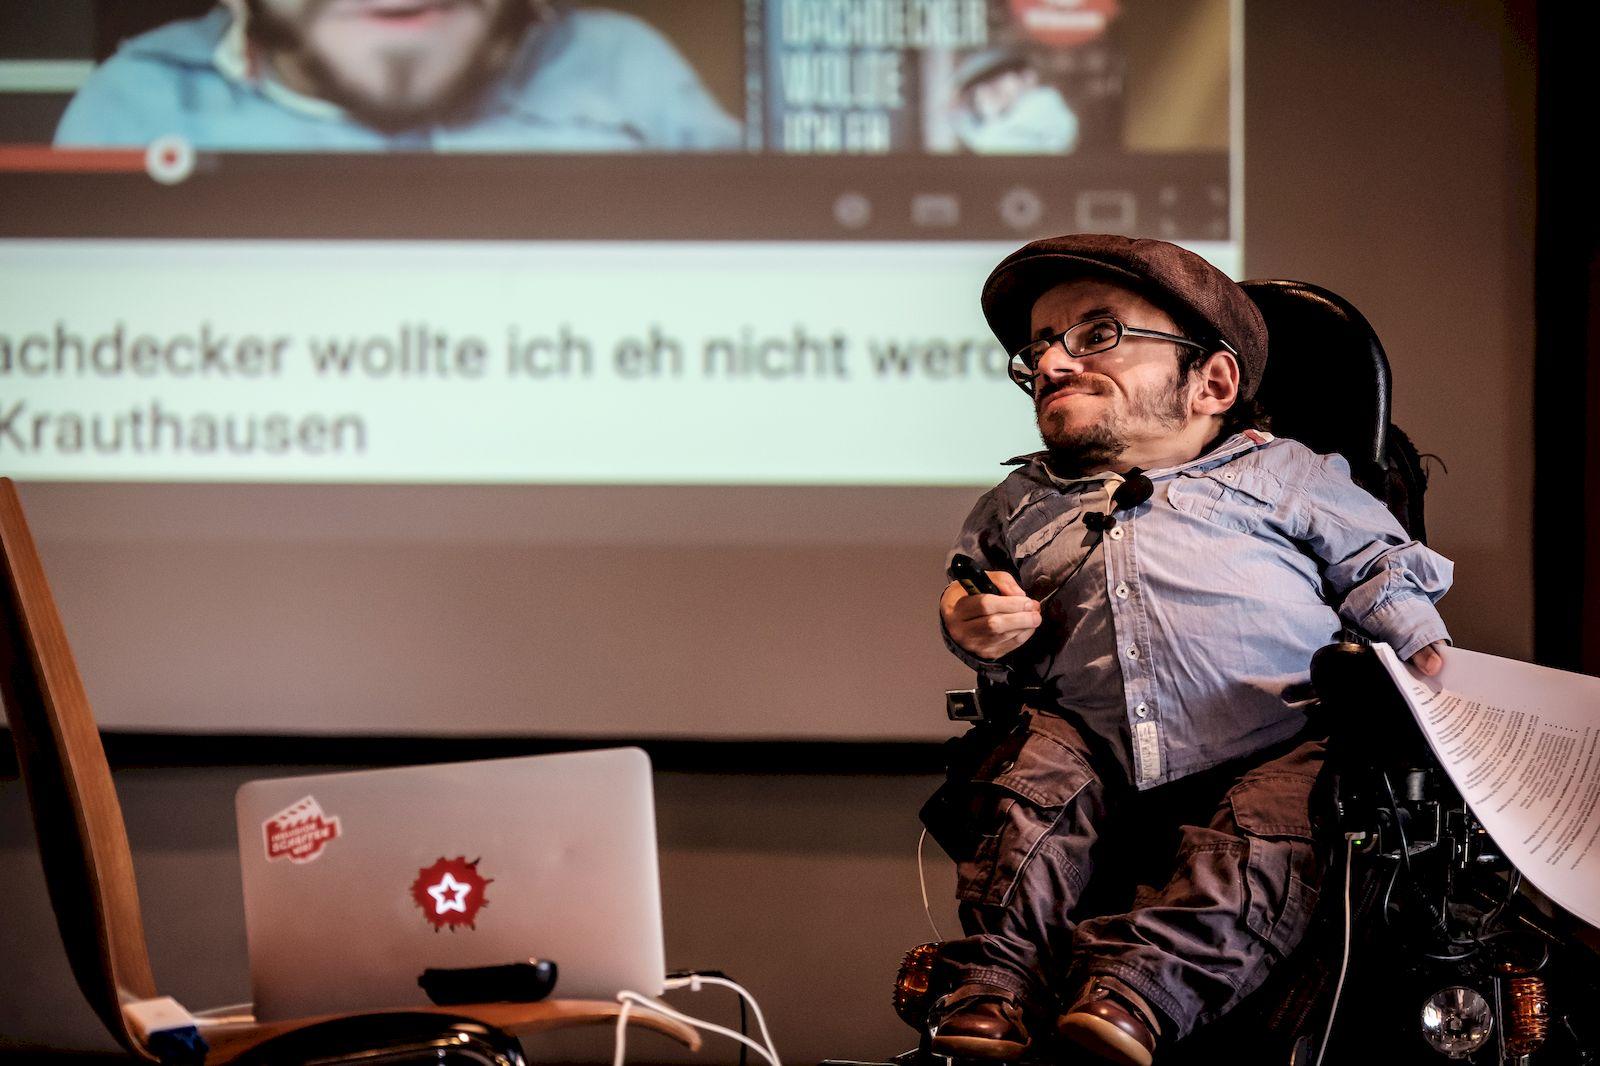 Campaign Boostcamp 2015 (Foto: Andi Weiland, www.andiweiland.de)